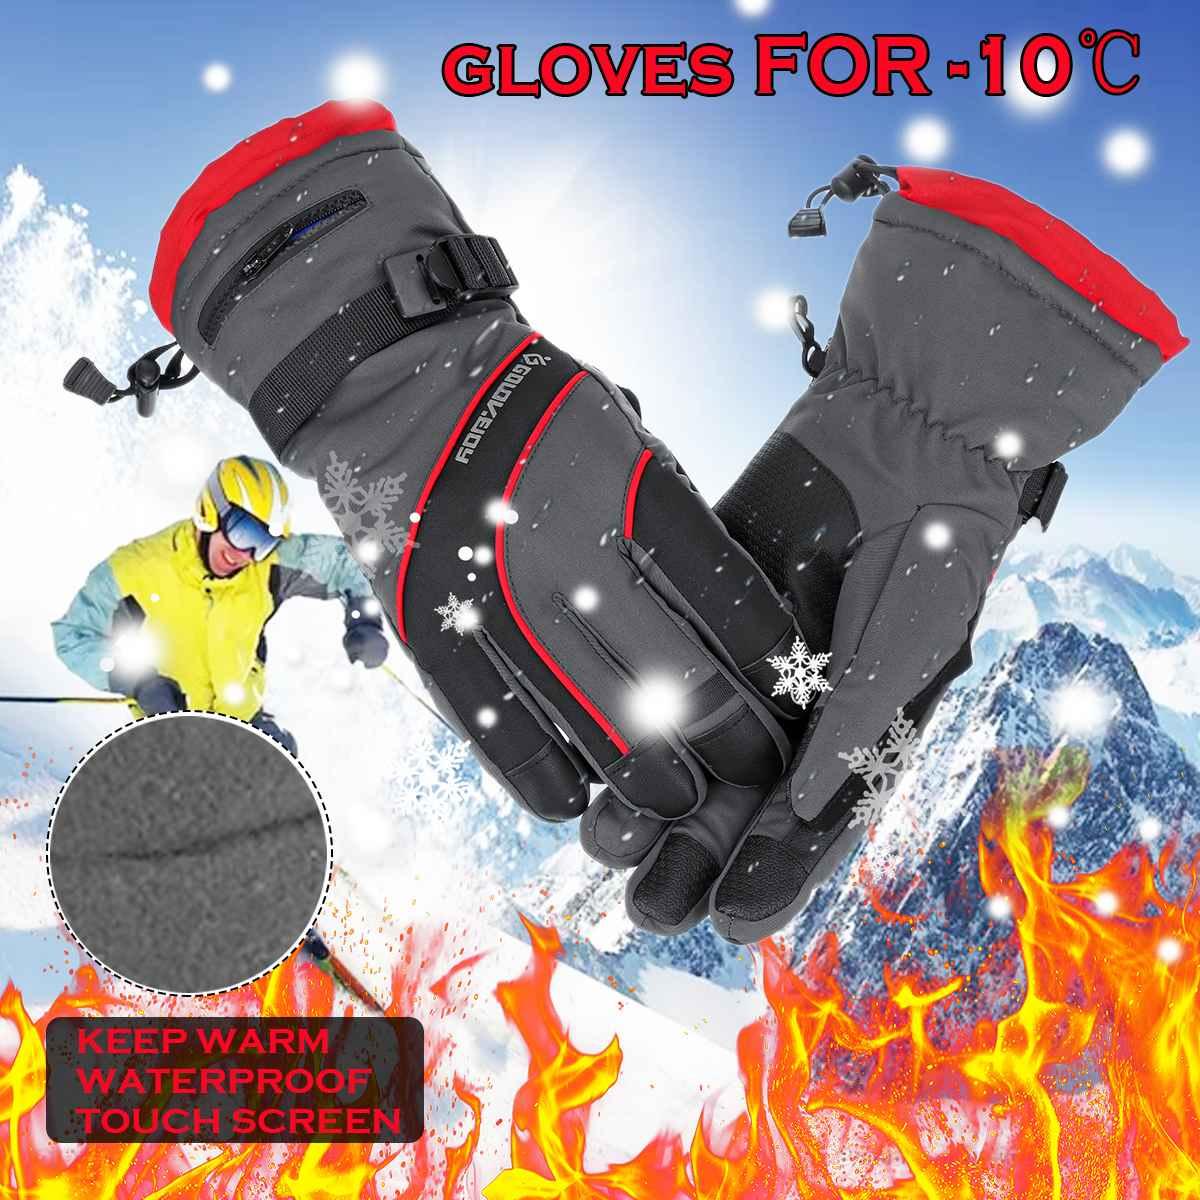 2020 Men's Ski Gloves Fleece Snowboard Gloves Snowmobile Motorcycle Riding Winter Gloves Windproof Waterproof Unisex Snow Gloves